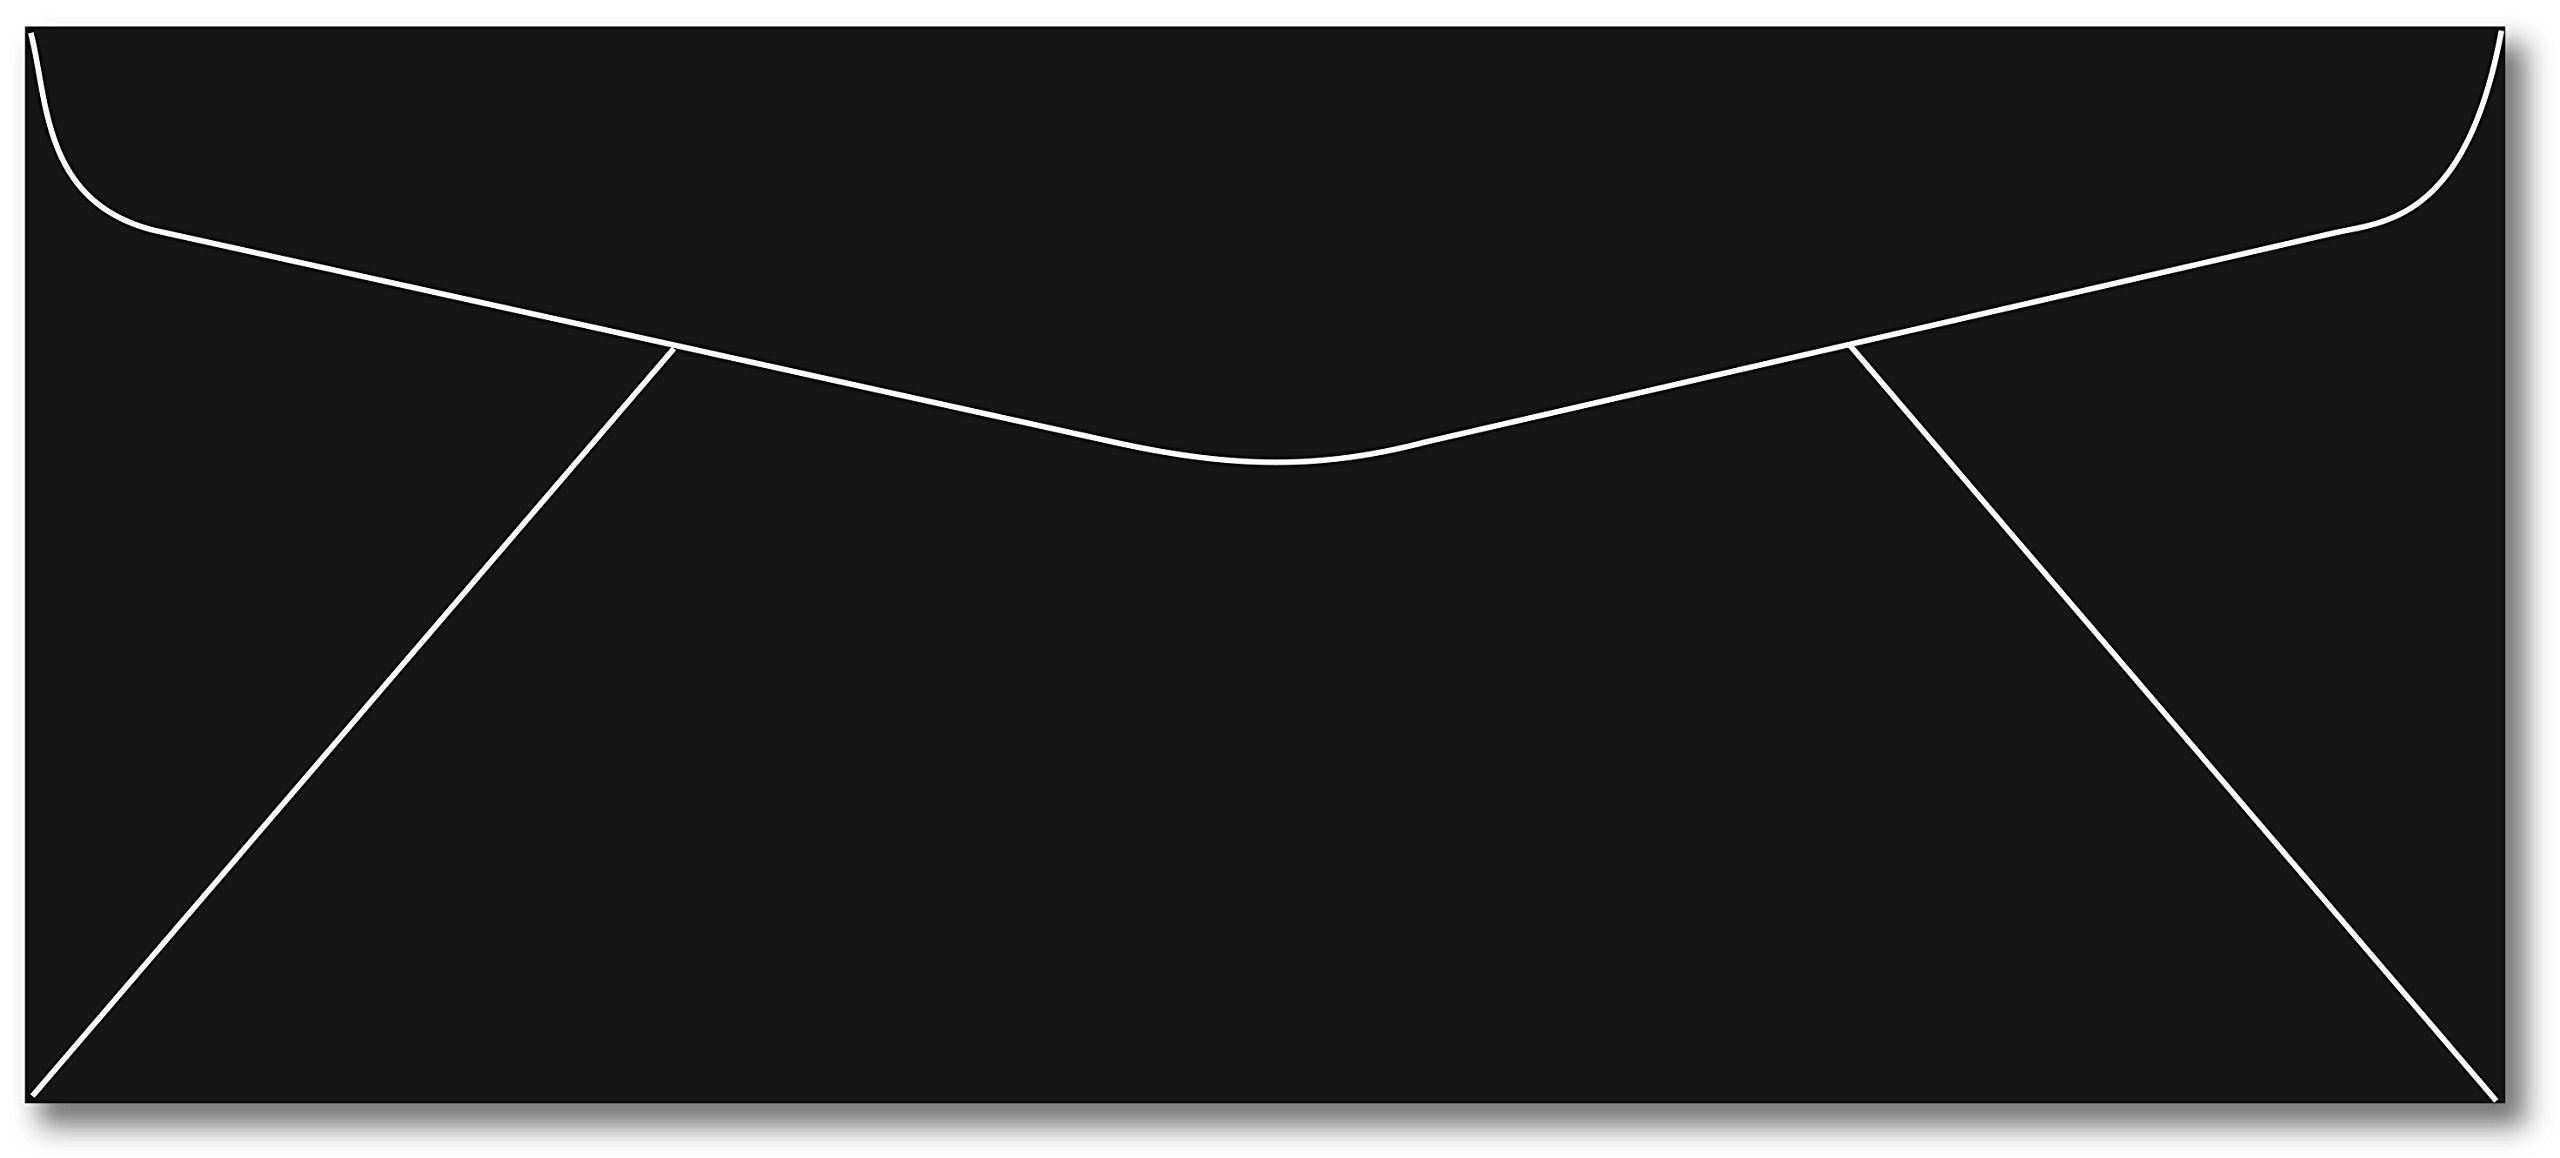 Black #10 Business Size Envelopes - 50 Envelopes